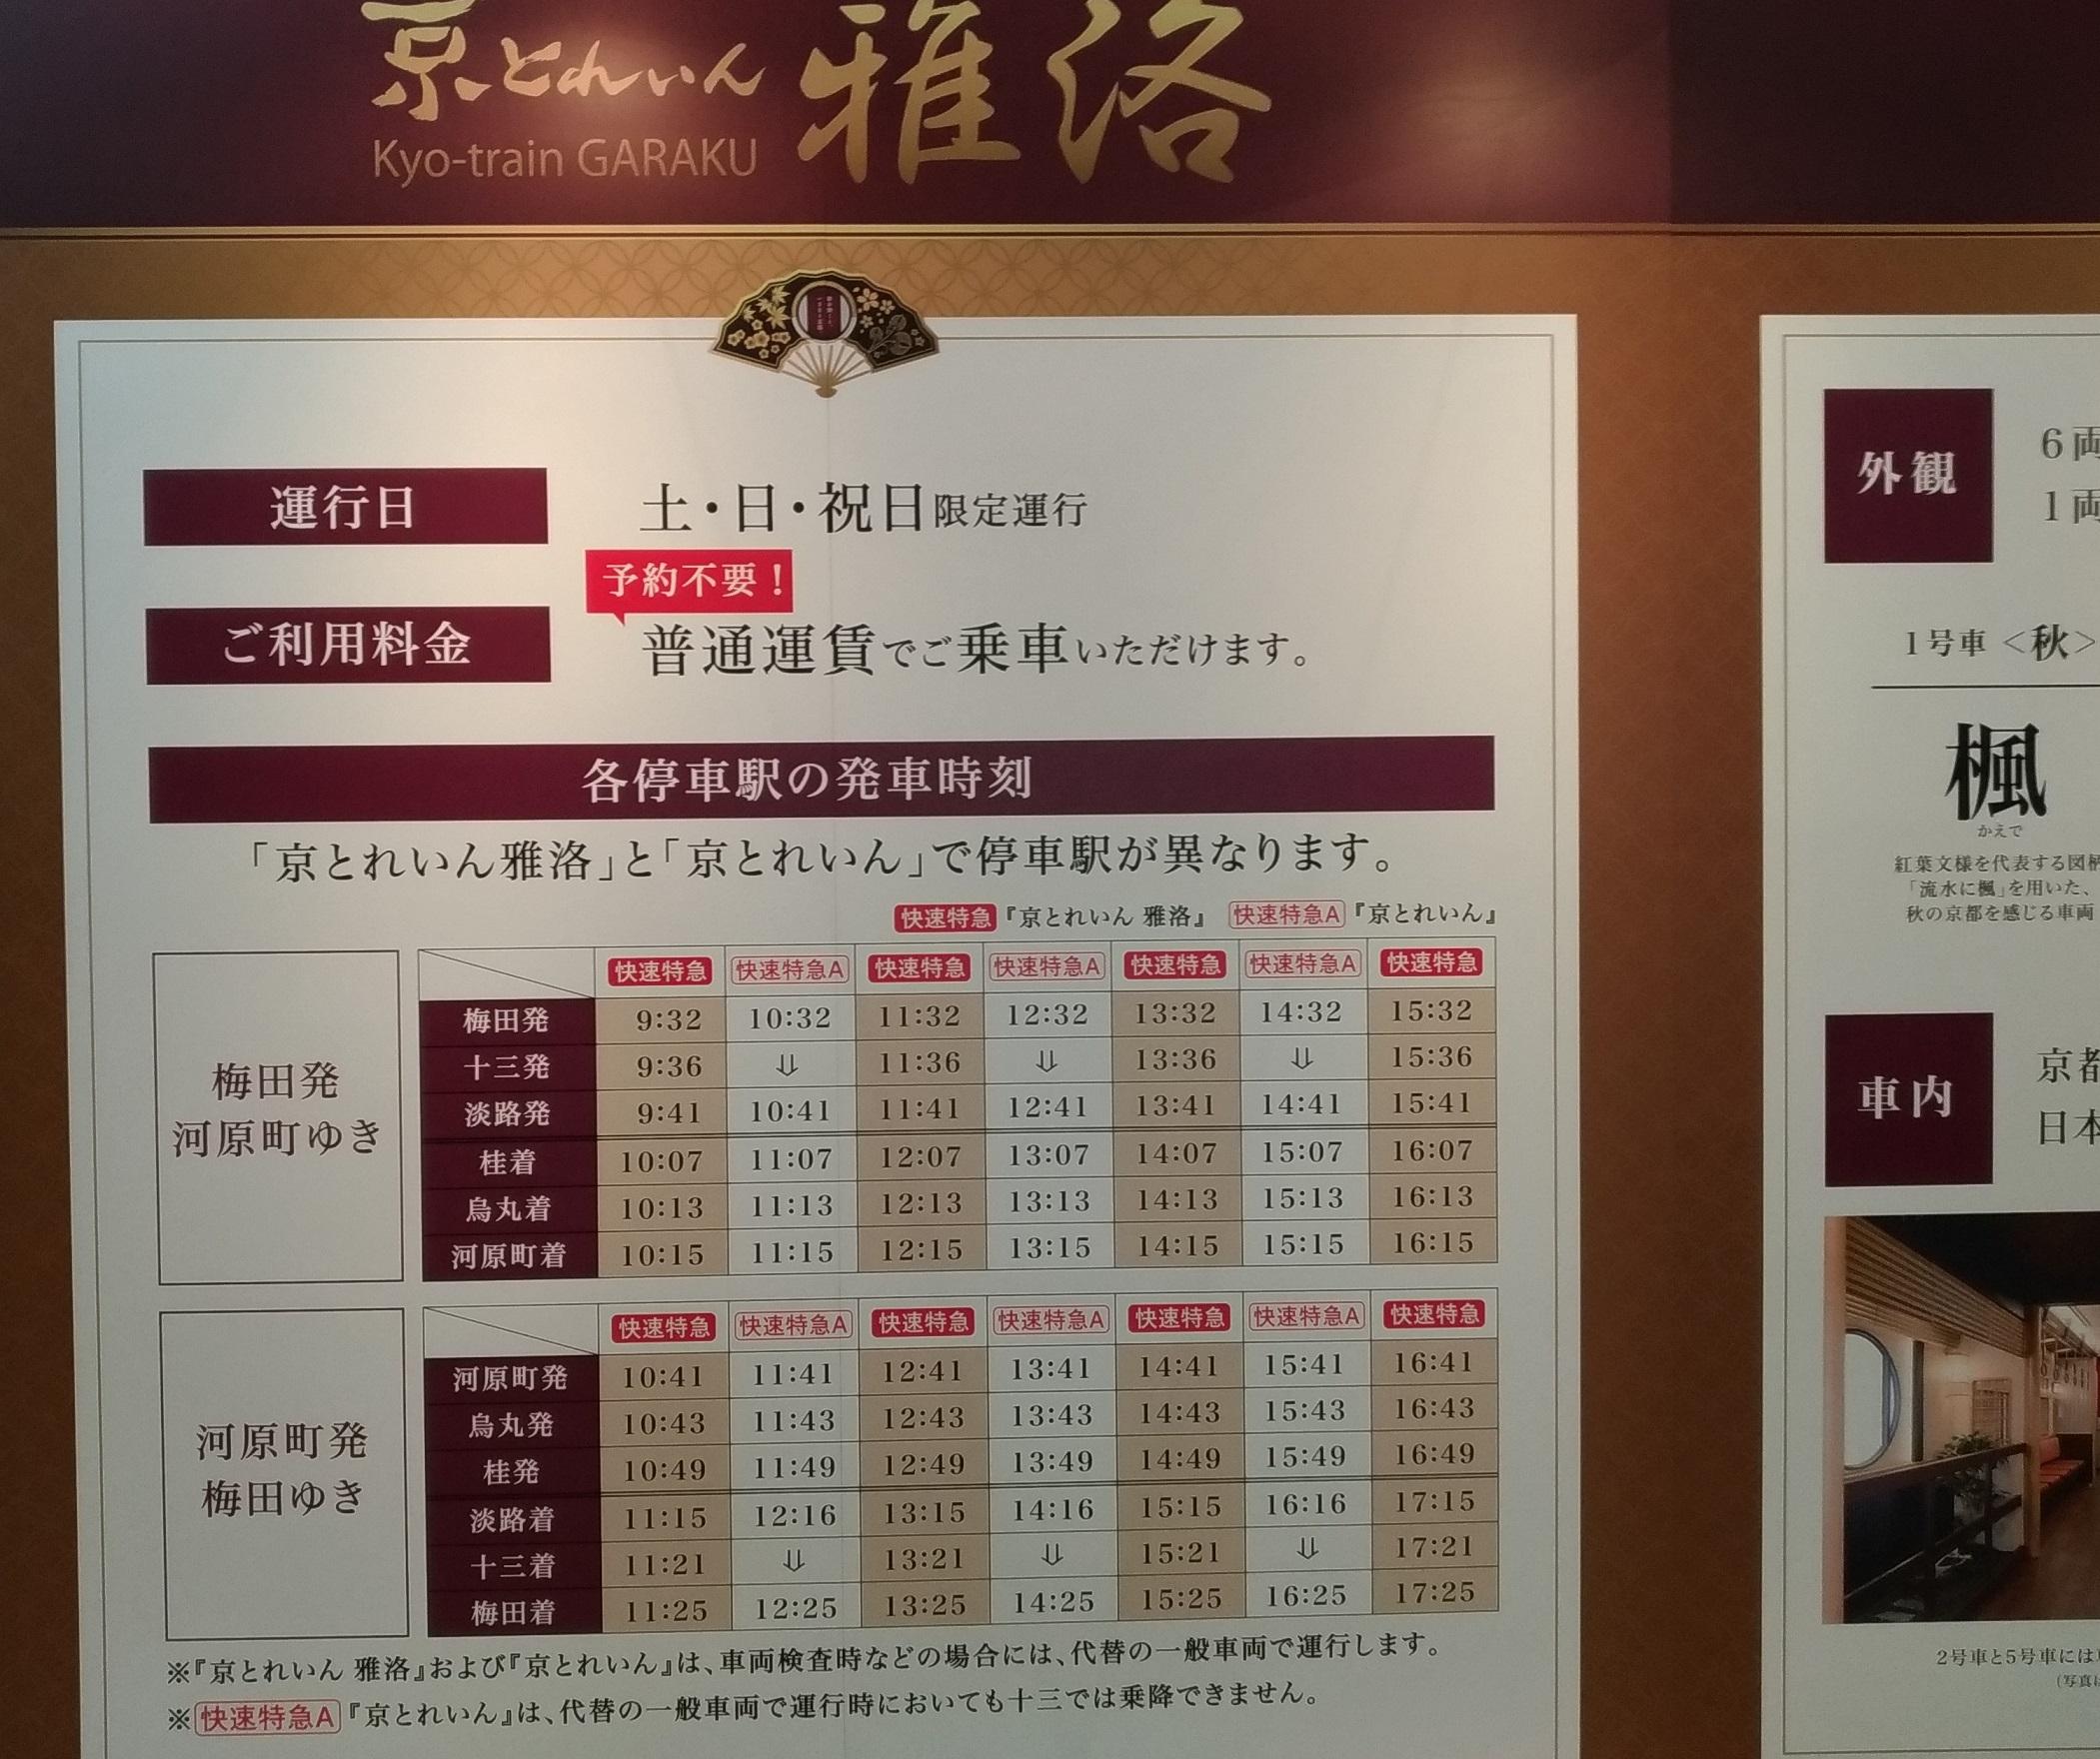 osaka_hankyu_train_kyo_garaku_2.jpg